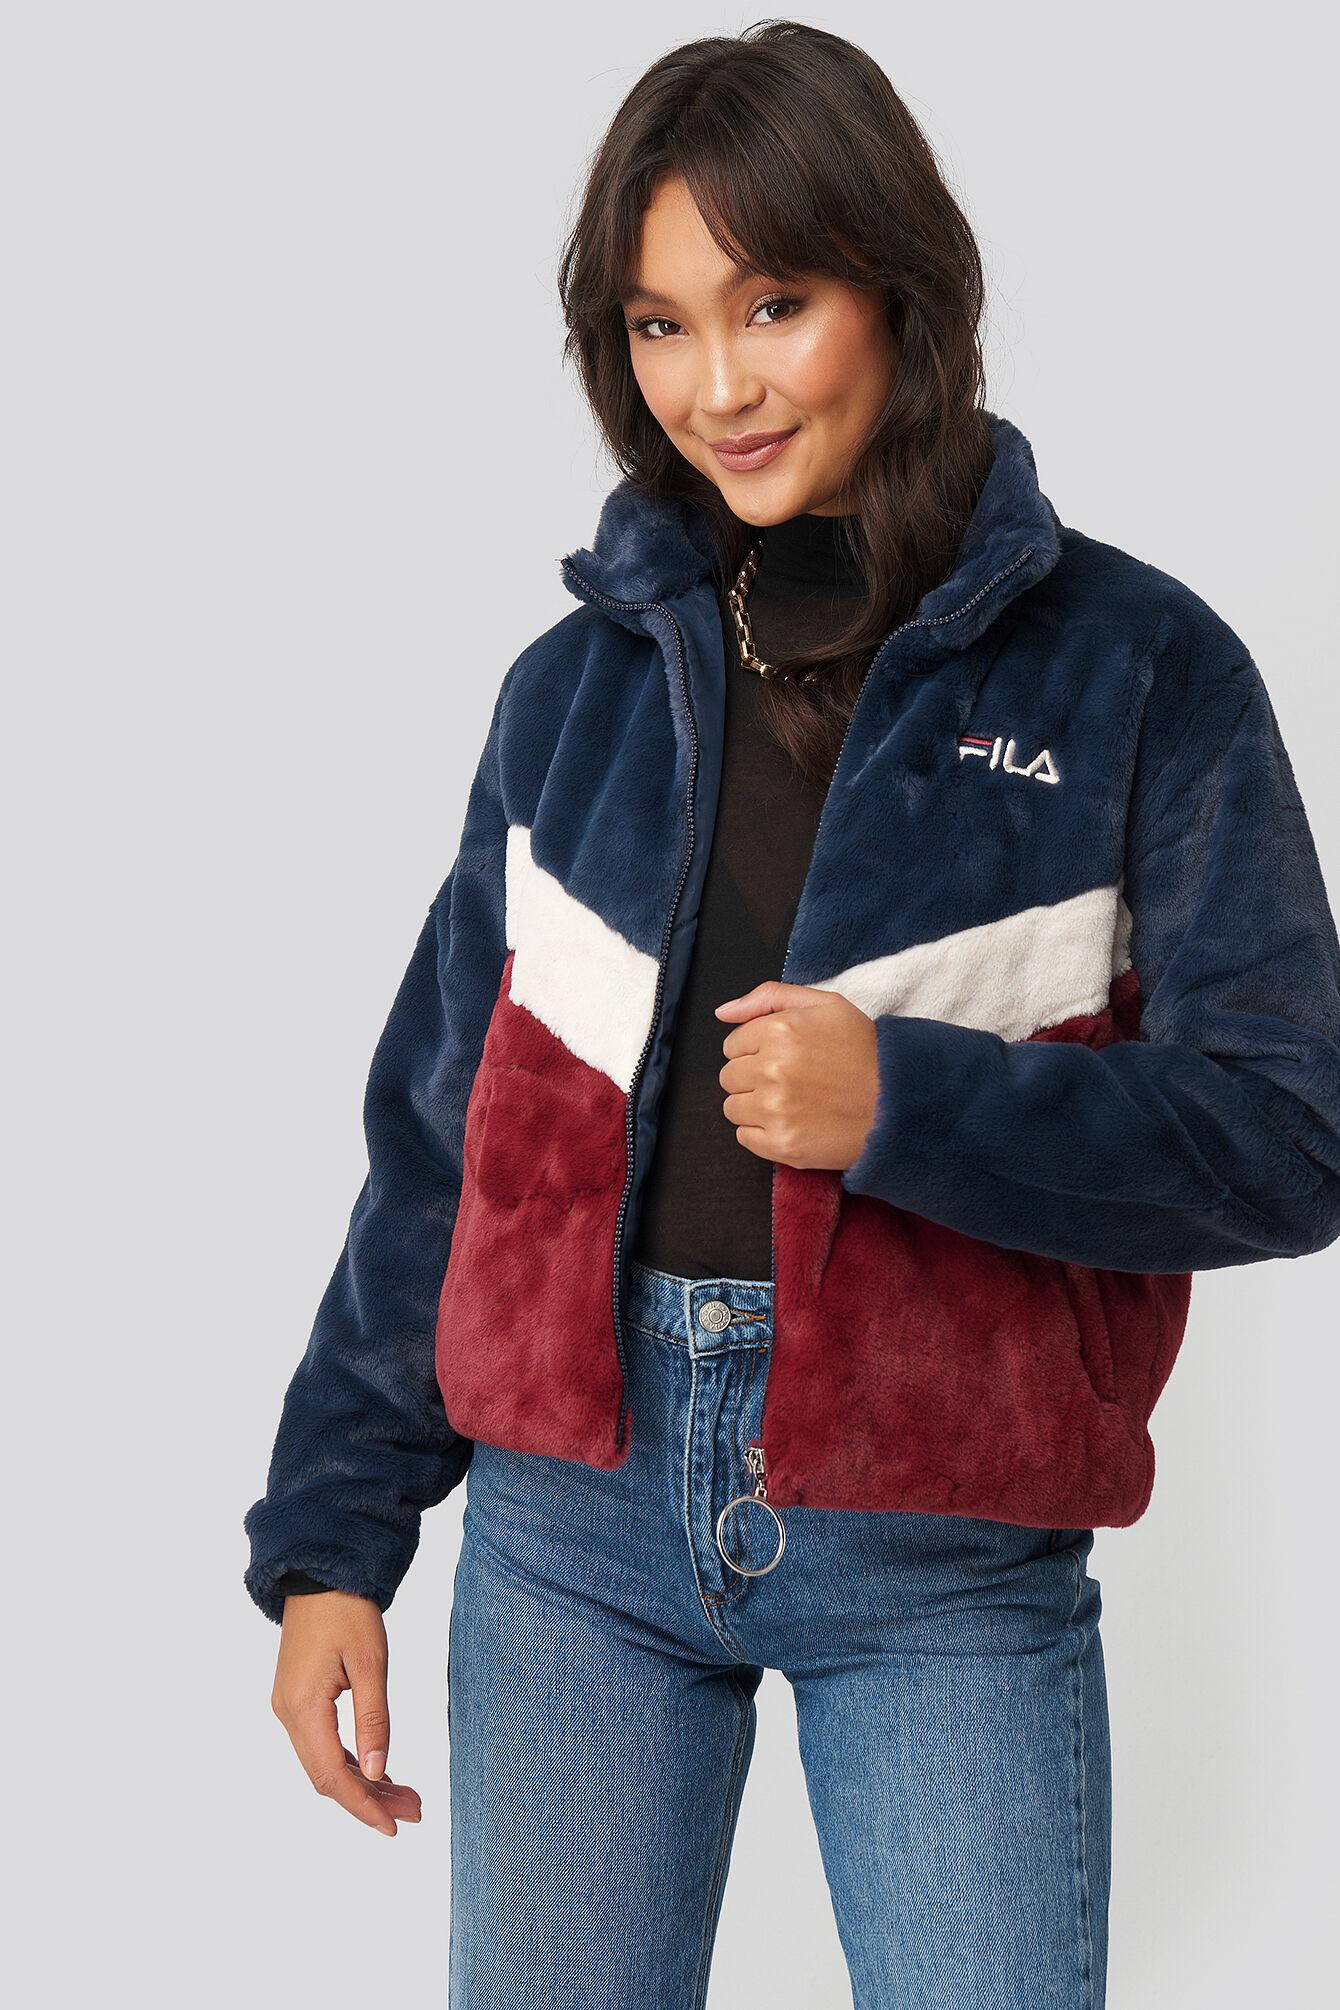 FILA Charmaine Jacket - Multicolor